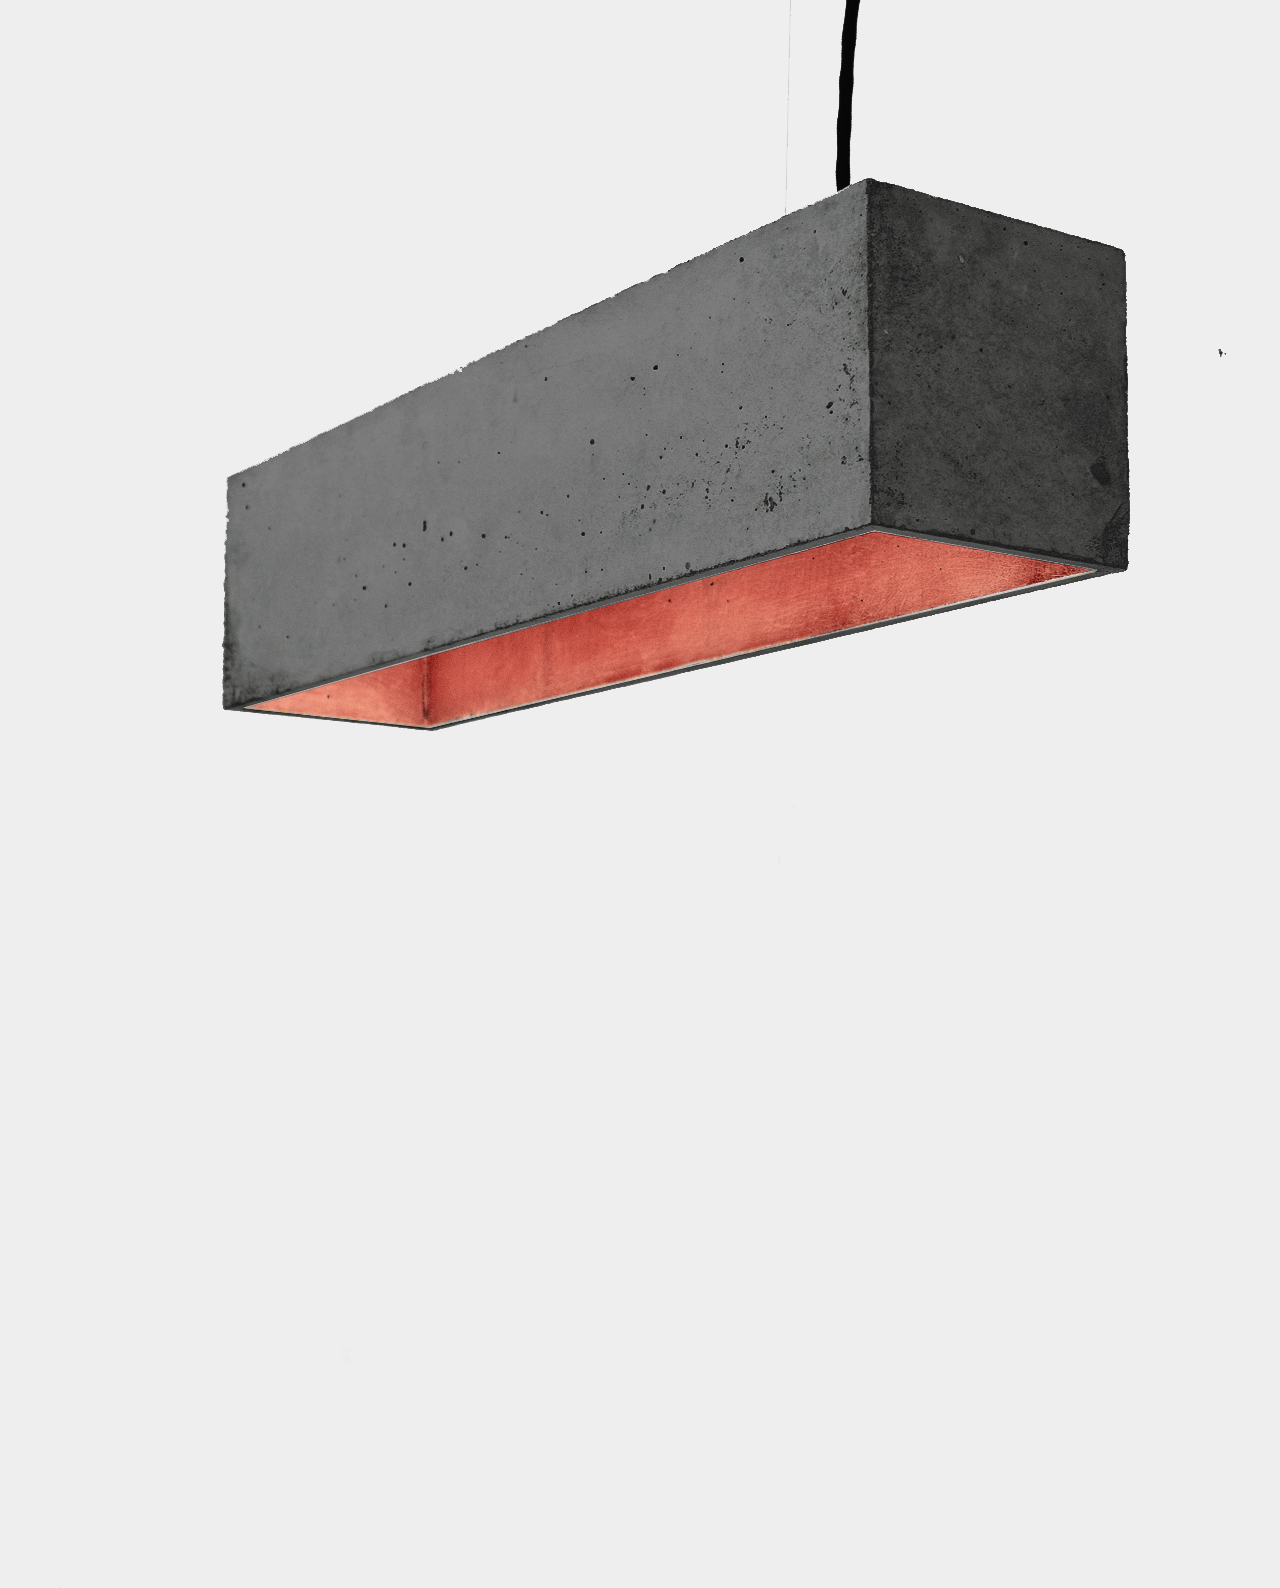 esstischlampe malou black jetzt online kaufen. Black Bedroom Furniture Sets. Home Design Ideas